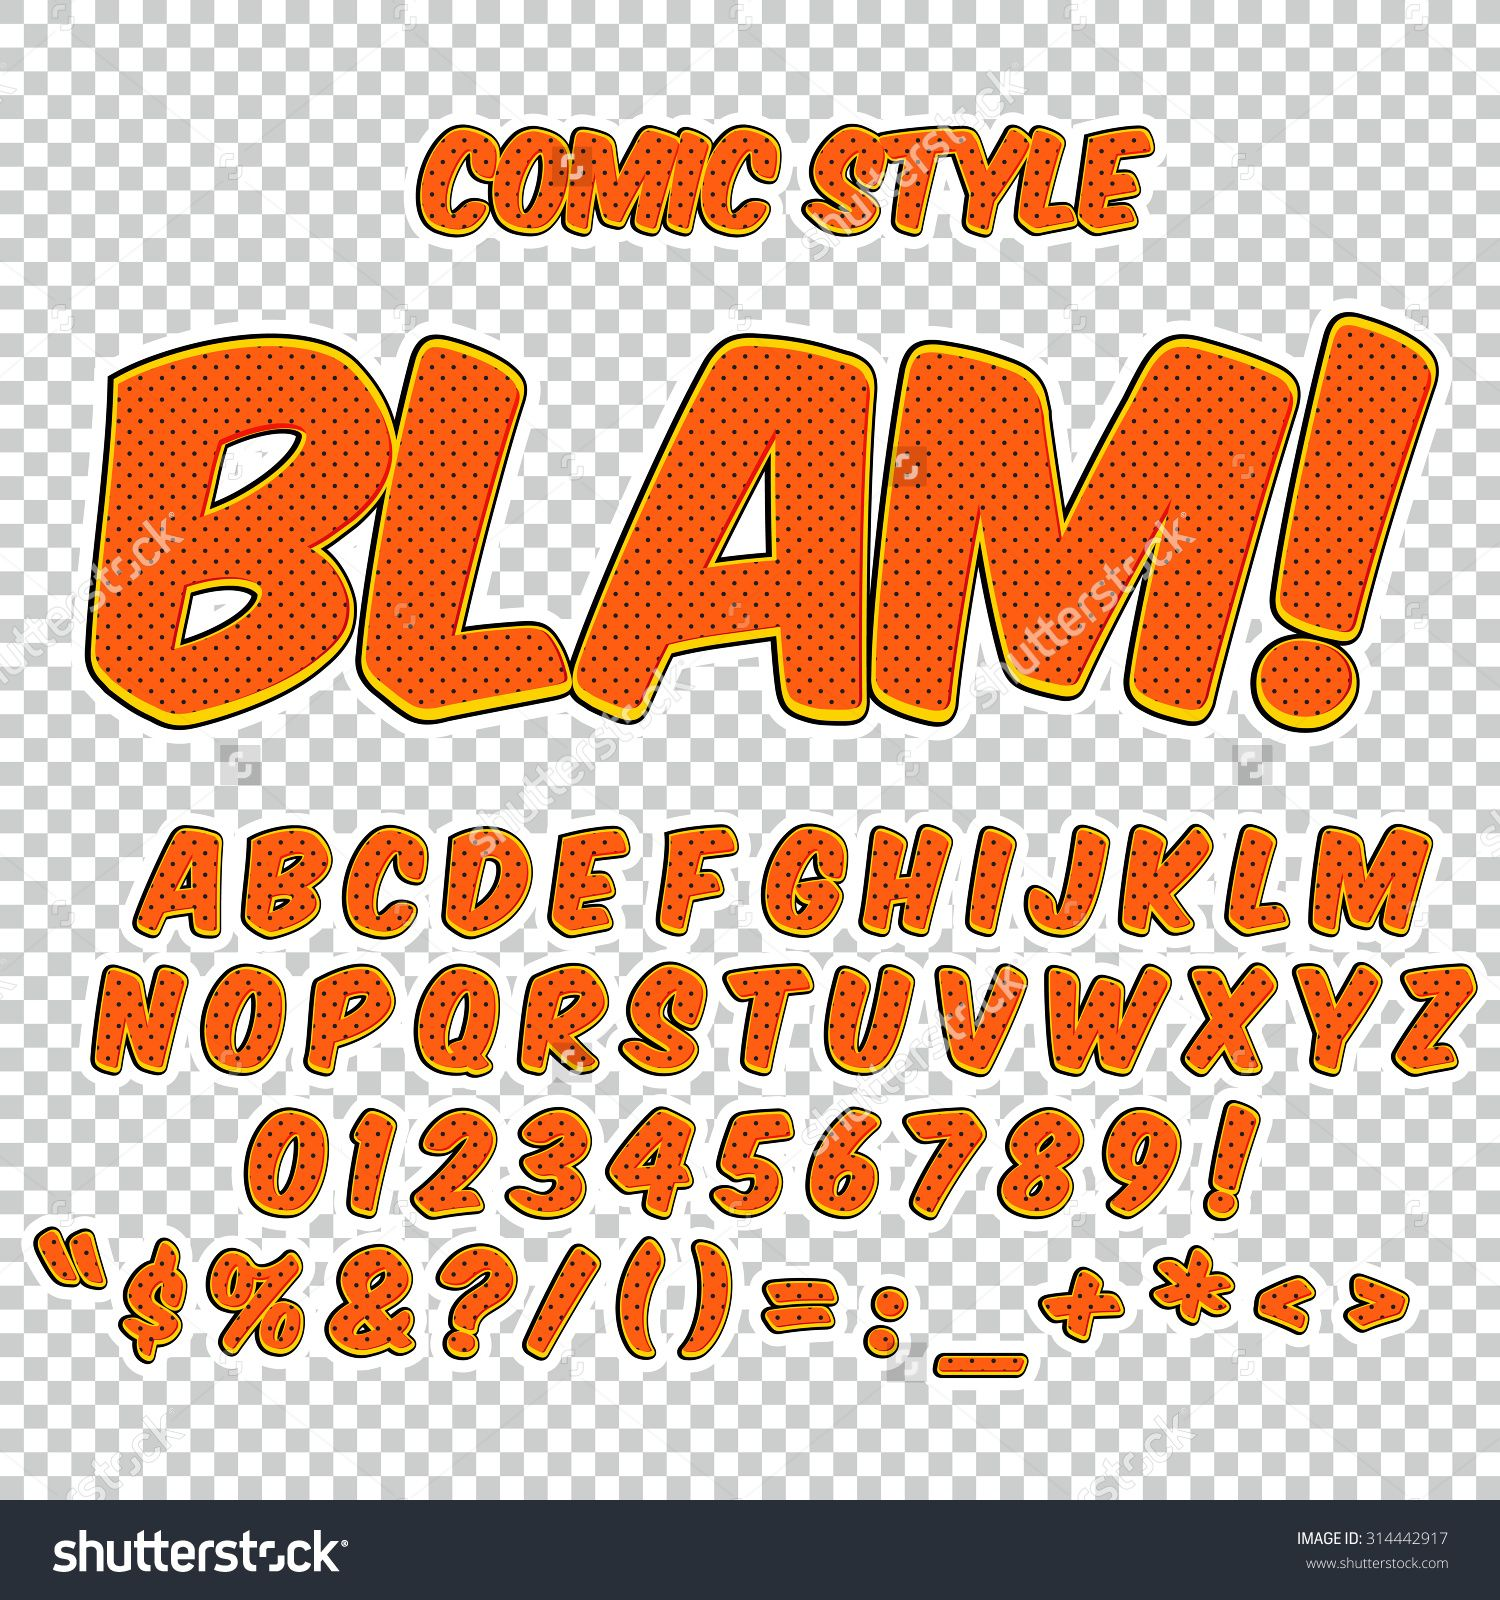 popart font - Google Search | Branding ideas | Pinterest